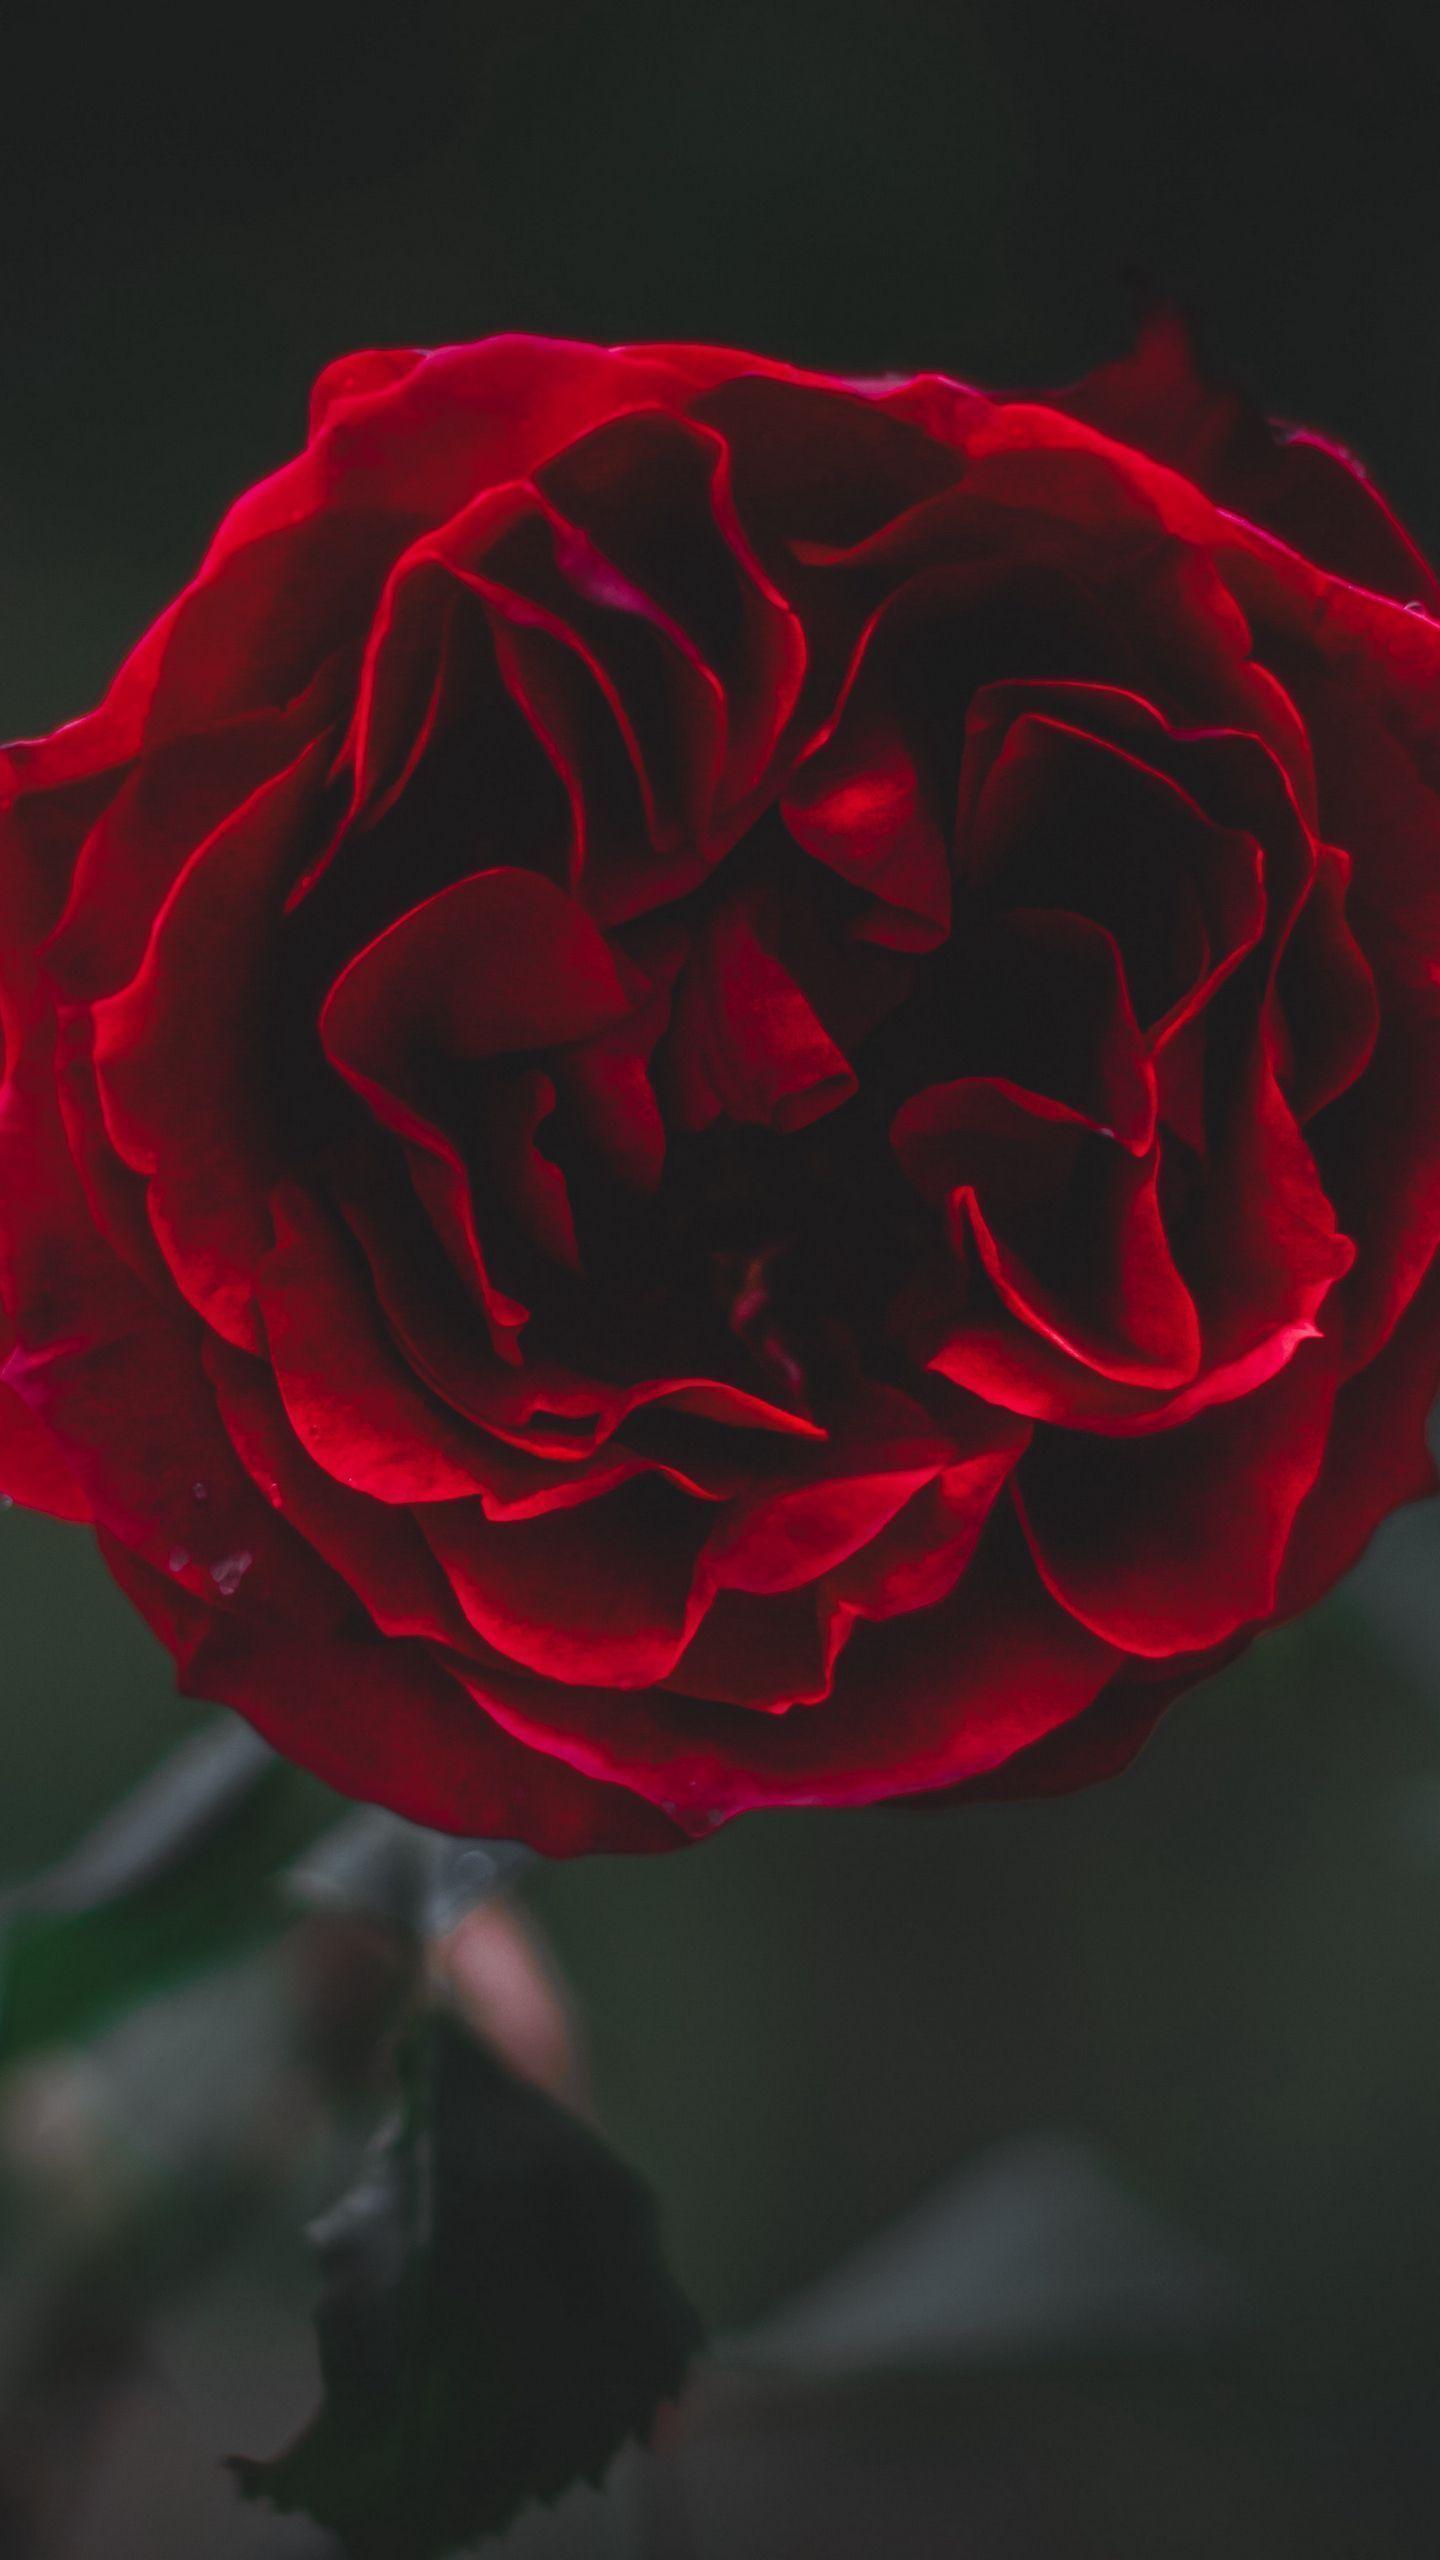 List of Good Black Wallpaper Iphone Dark Rose for iPhone 11 Pro 2020